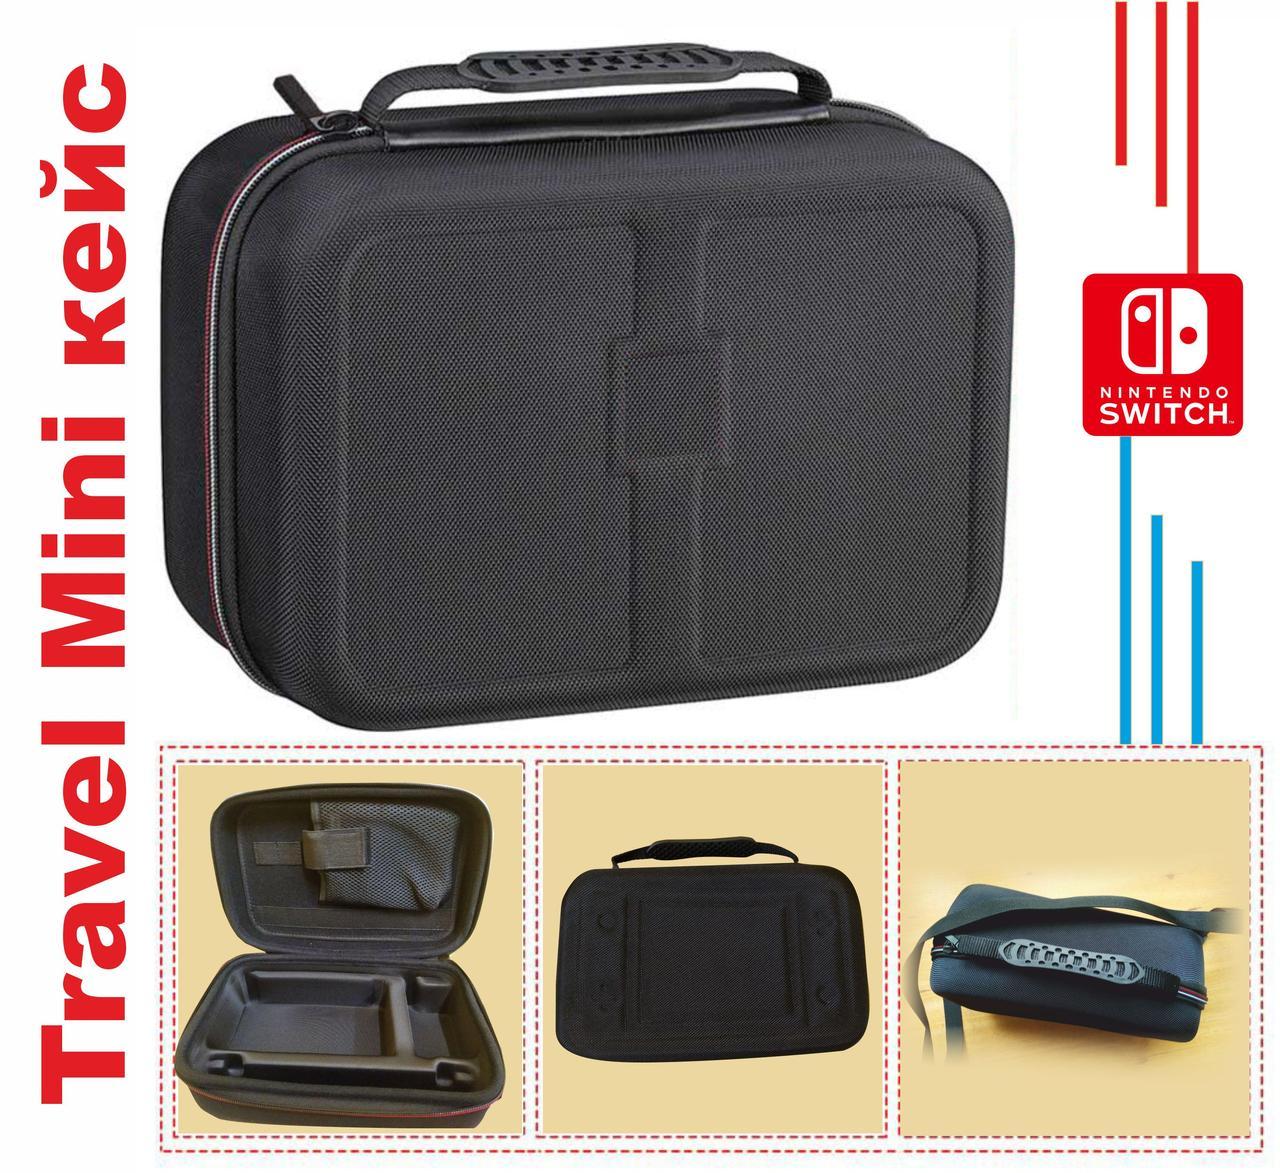 Mini Travel кейс чехол для Nintendo Switch / Стекла / Пленки /